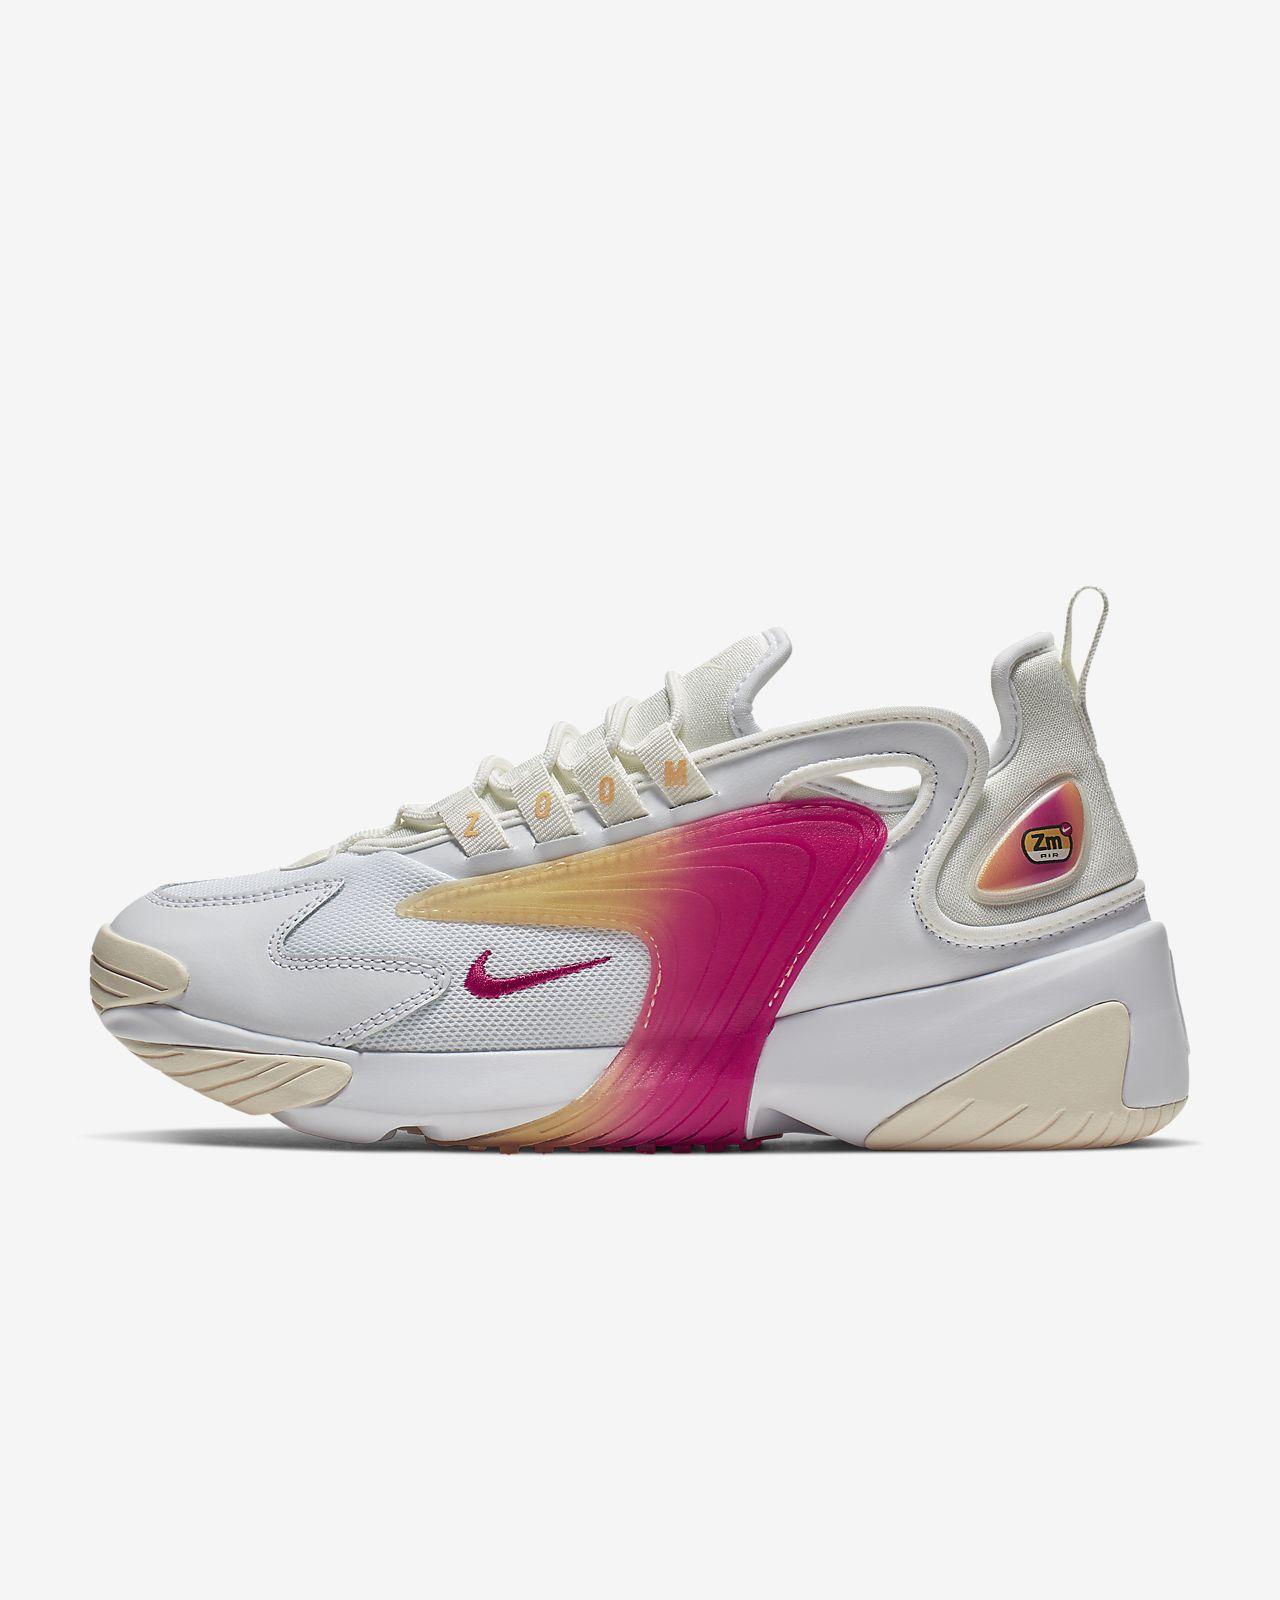 quality design b344d c7486 ... Scarpa Nike Zoom 2K - Donna